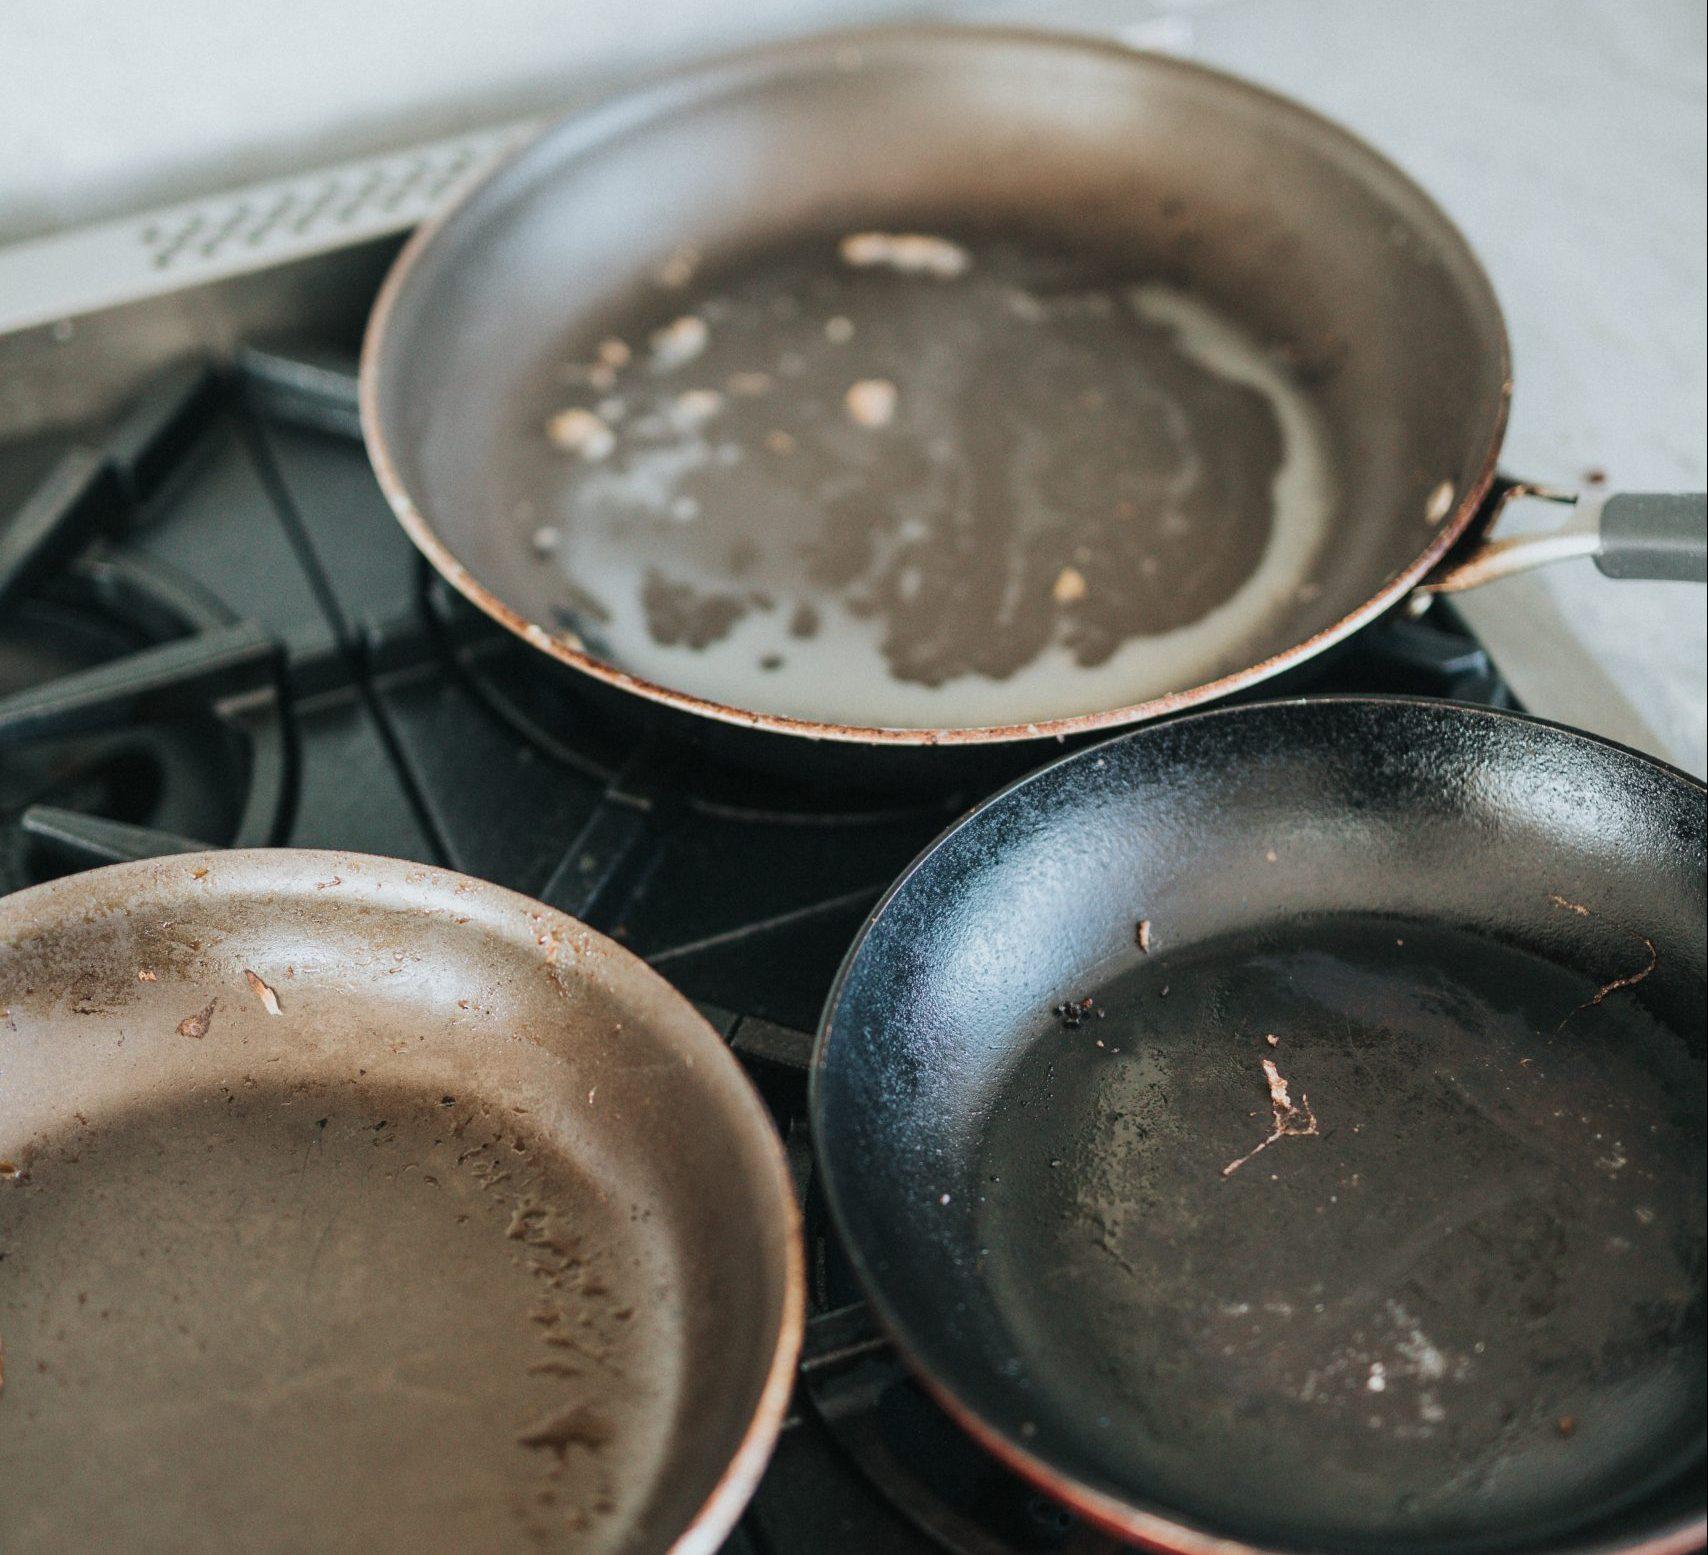 Three greasy pans on stove range.